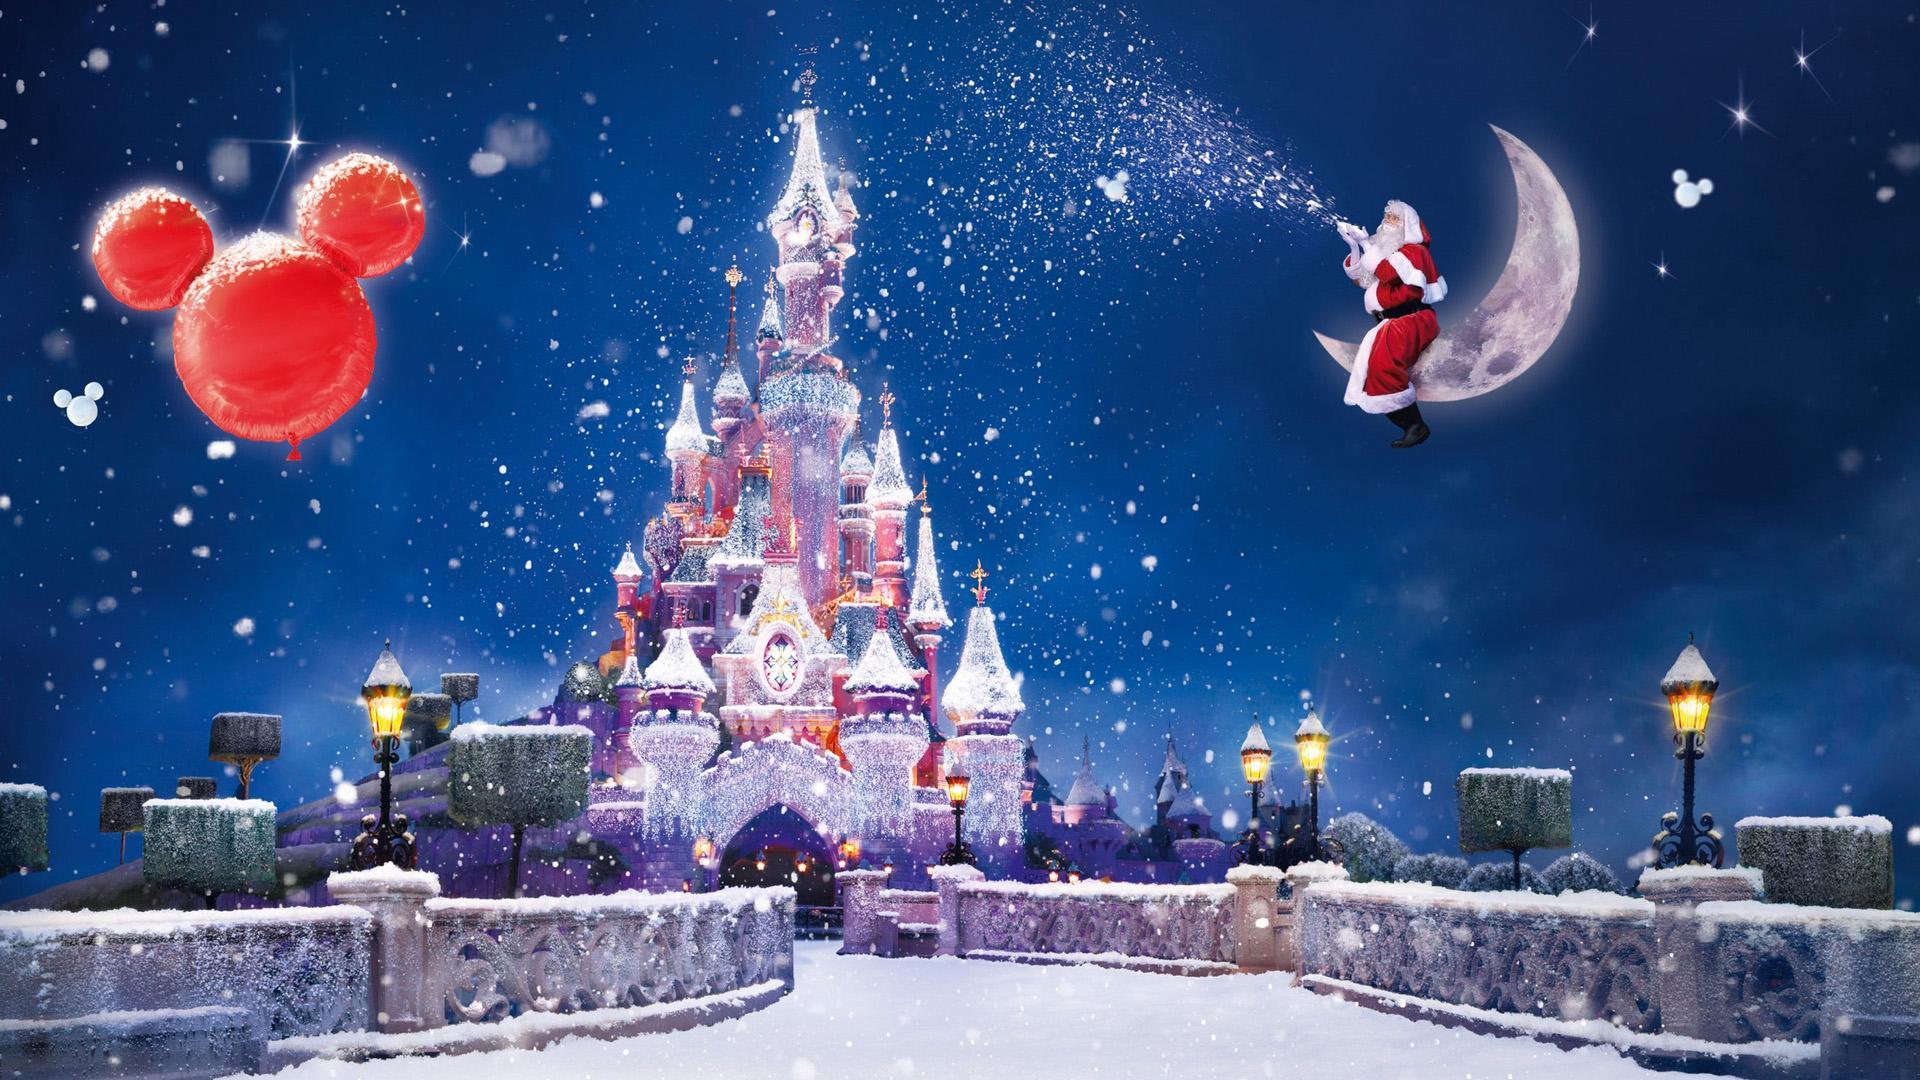 Christmas HD wallpaper 1920x1080 43050 1920x1080